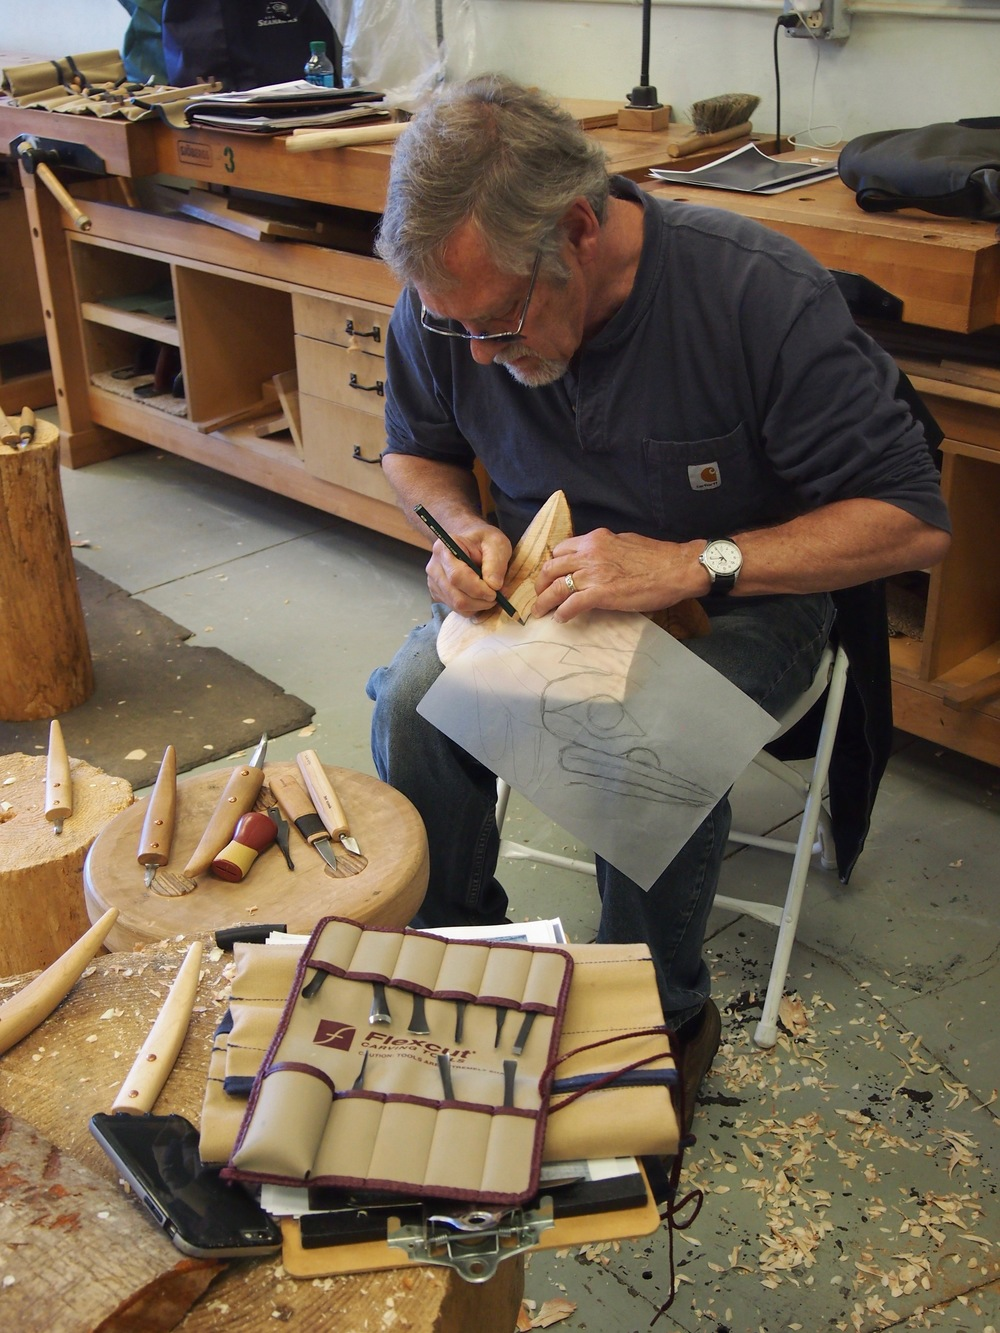 Tlingit Mask Carving Steve Brown758.jpg